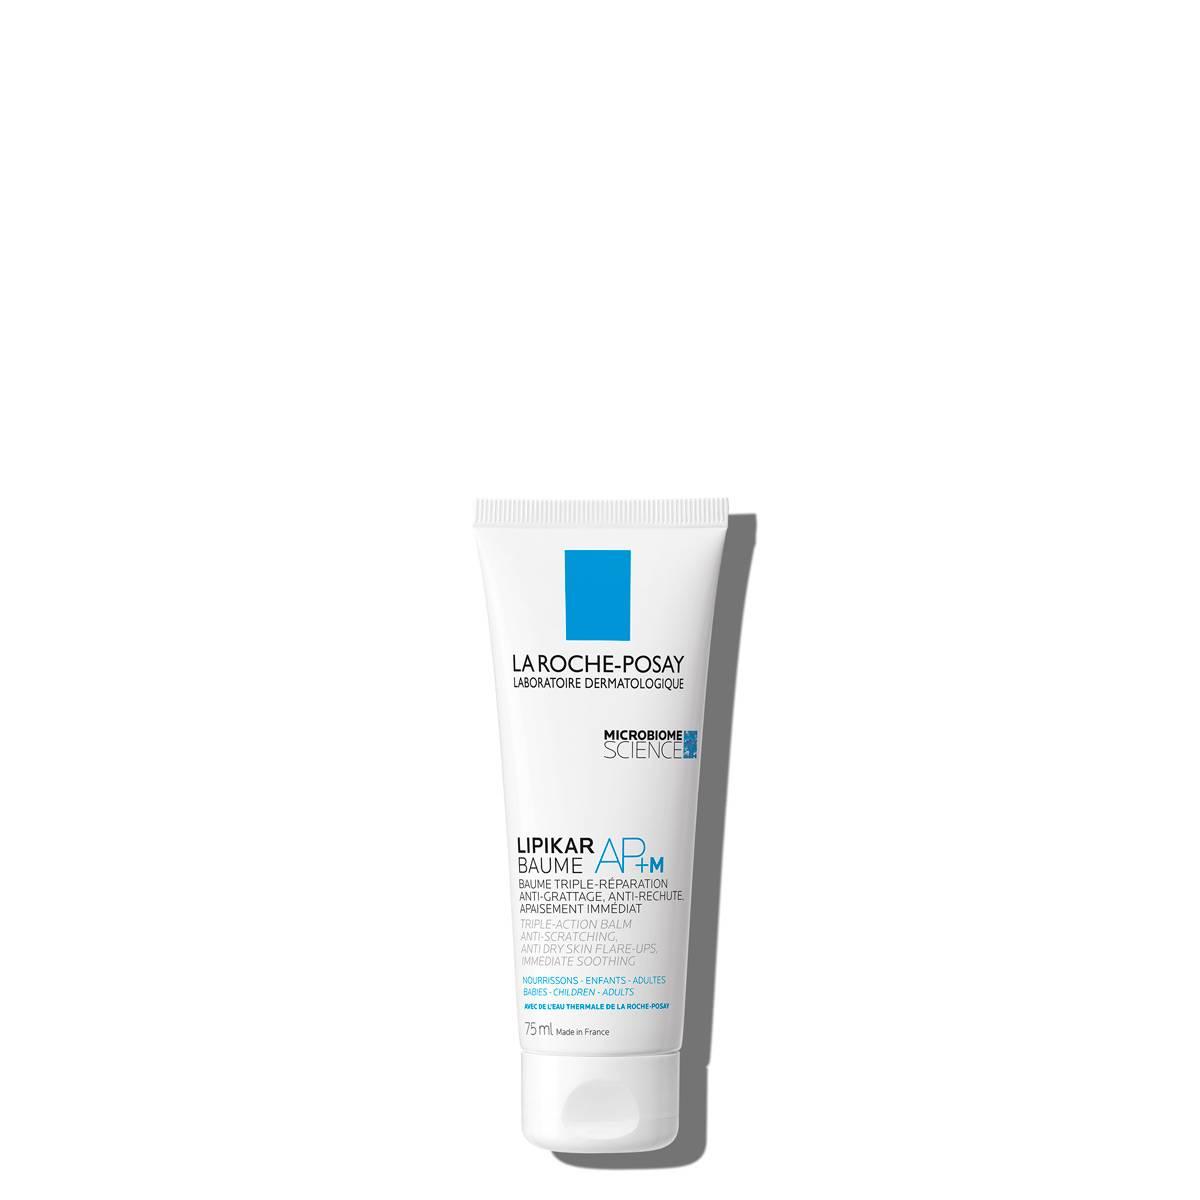 La Roche Posay Body Care Lipikar Baume APM 75ml Lipid Replenishing Balm AntiIrritation Scratching 0003337872421037